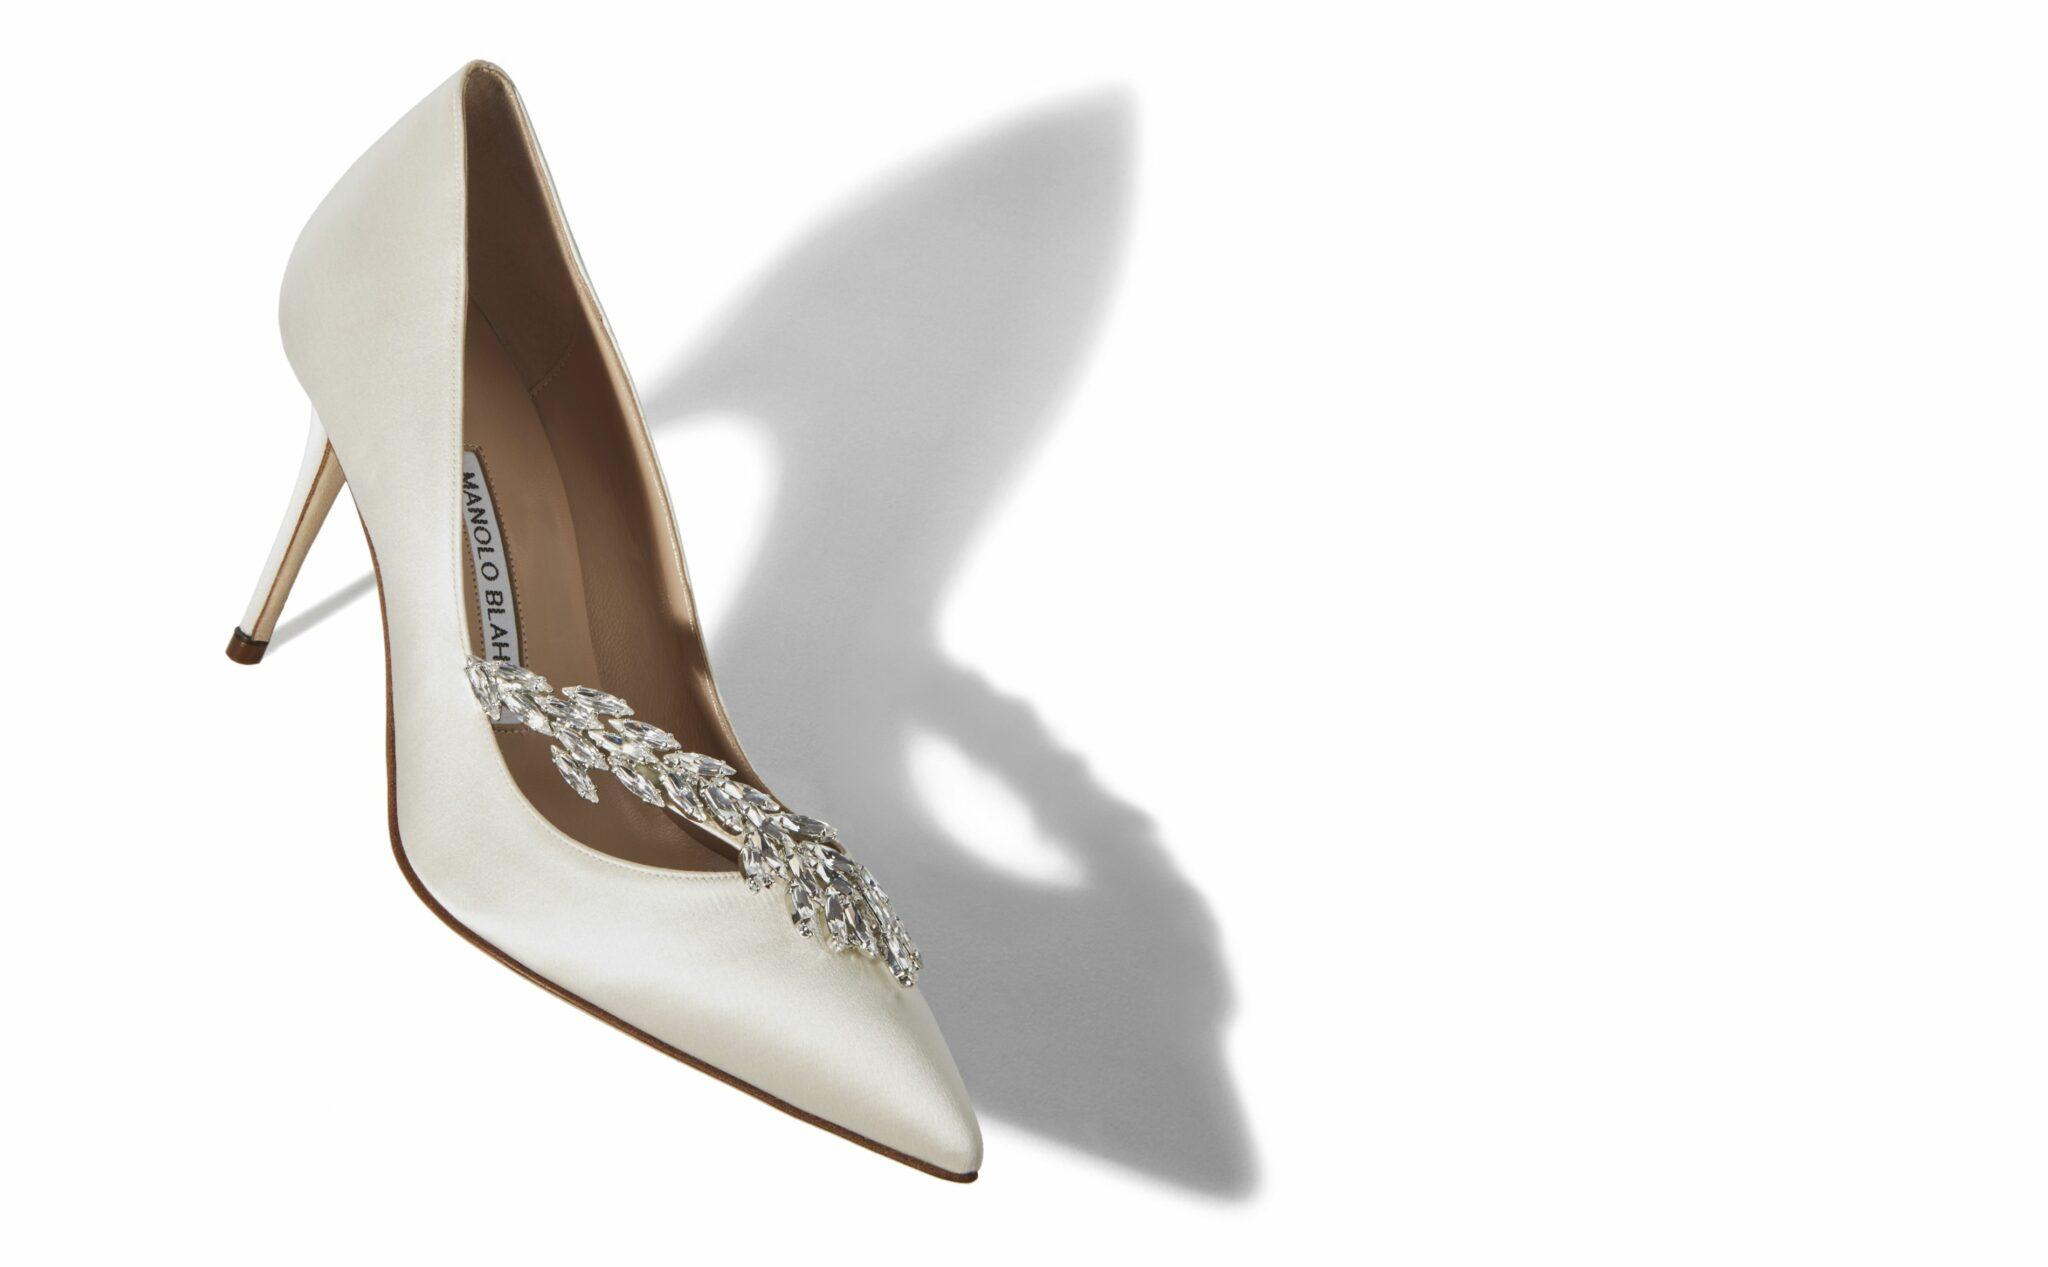 Sepatu-Wanita-Manolo-Blahnik